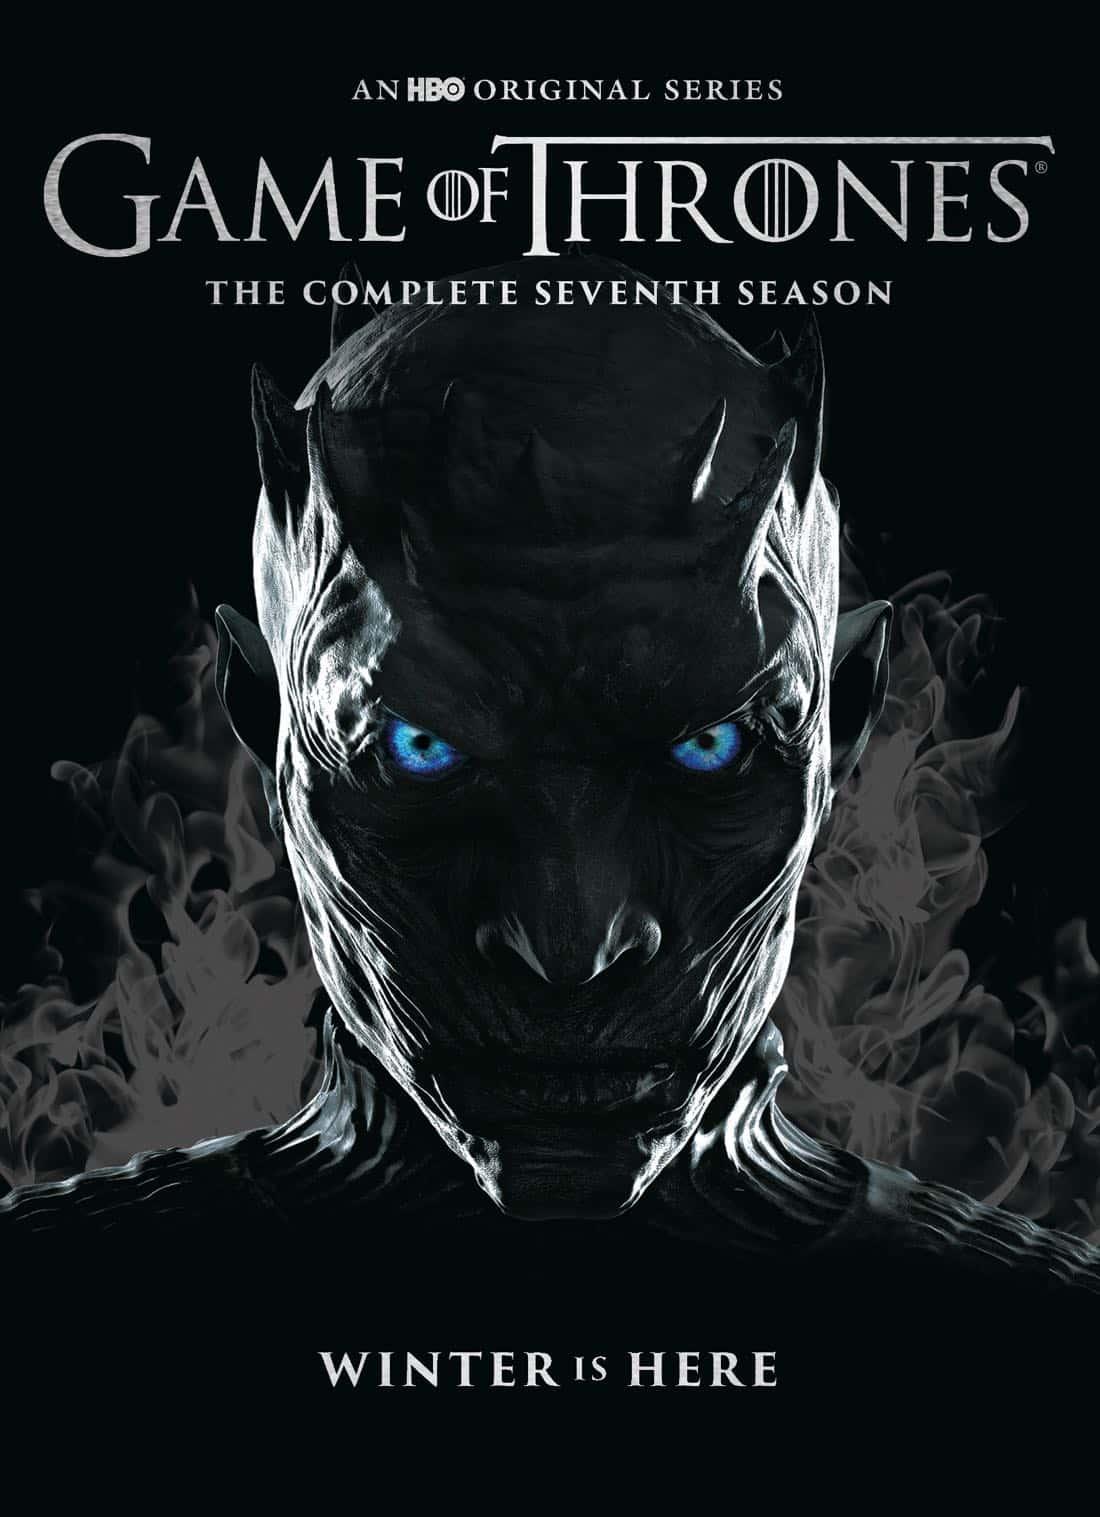 Game of Thrones Season 7 DVD